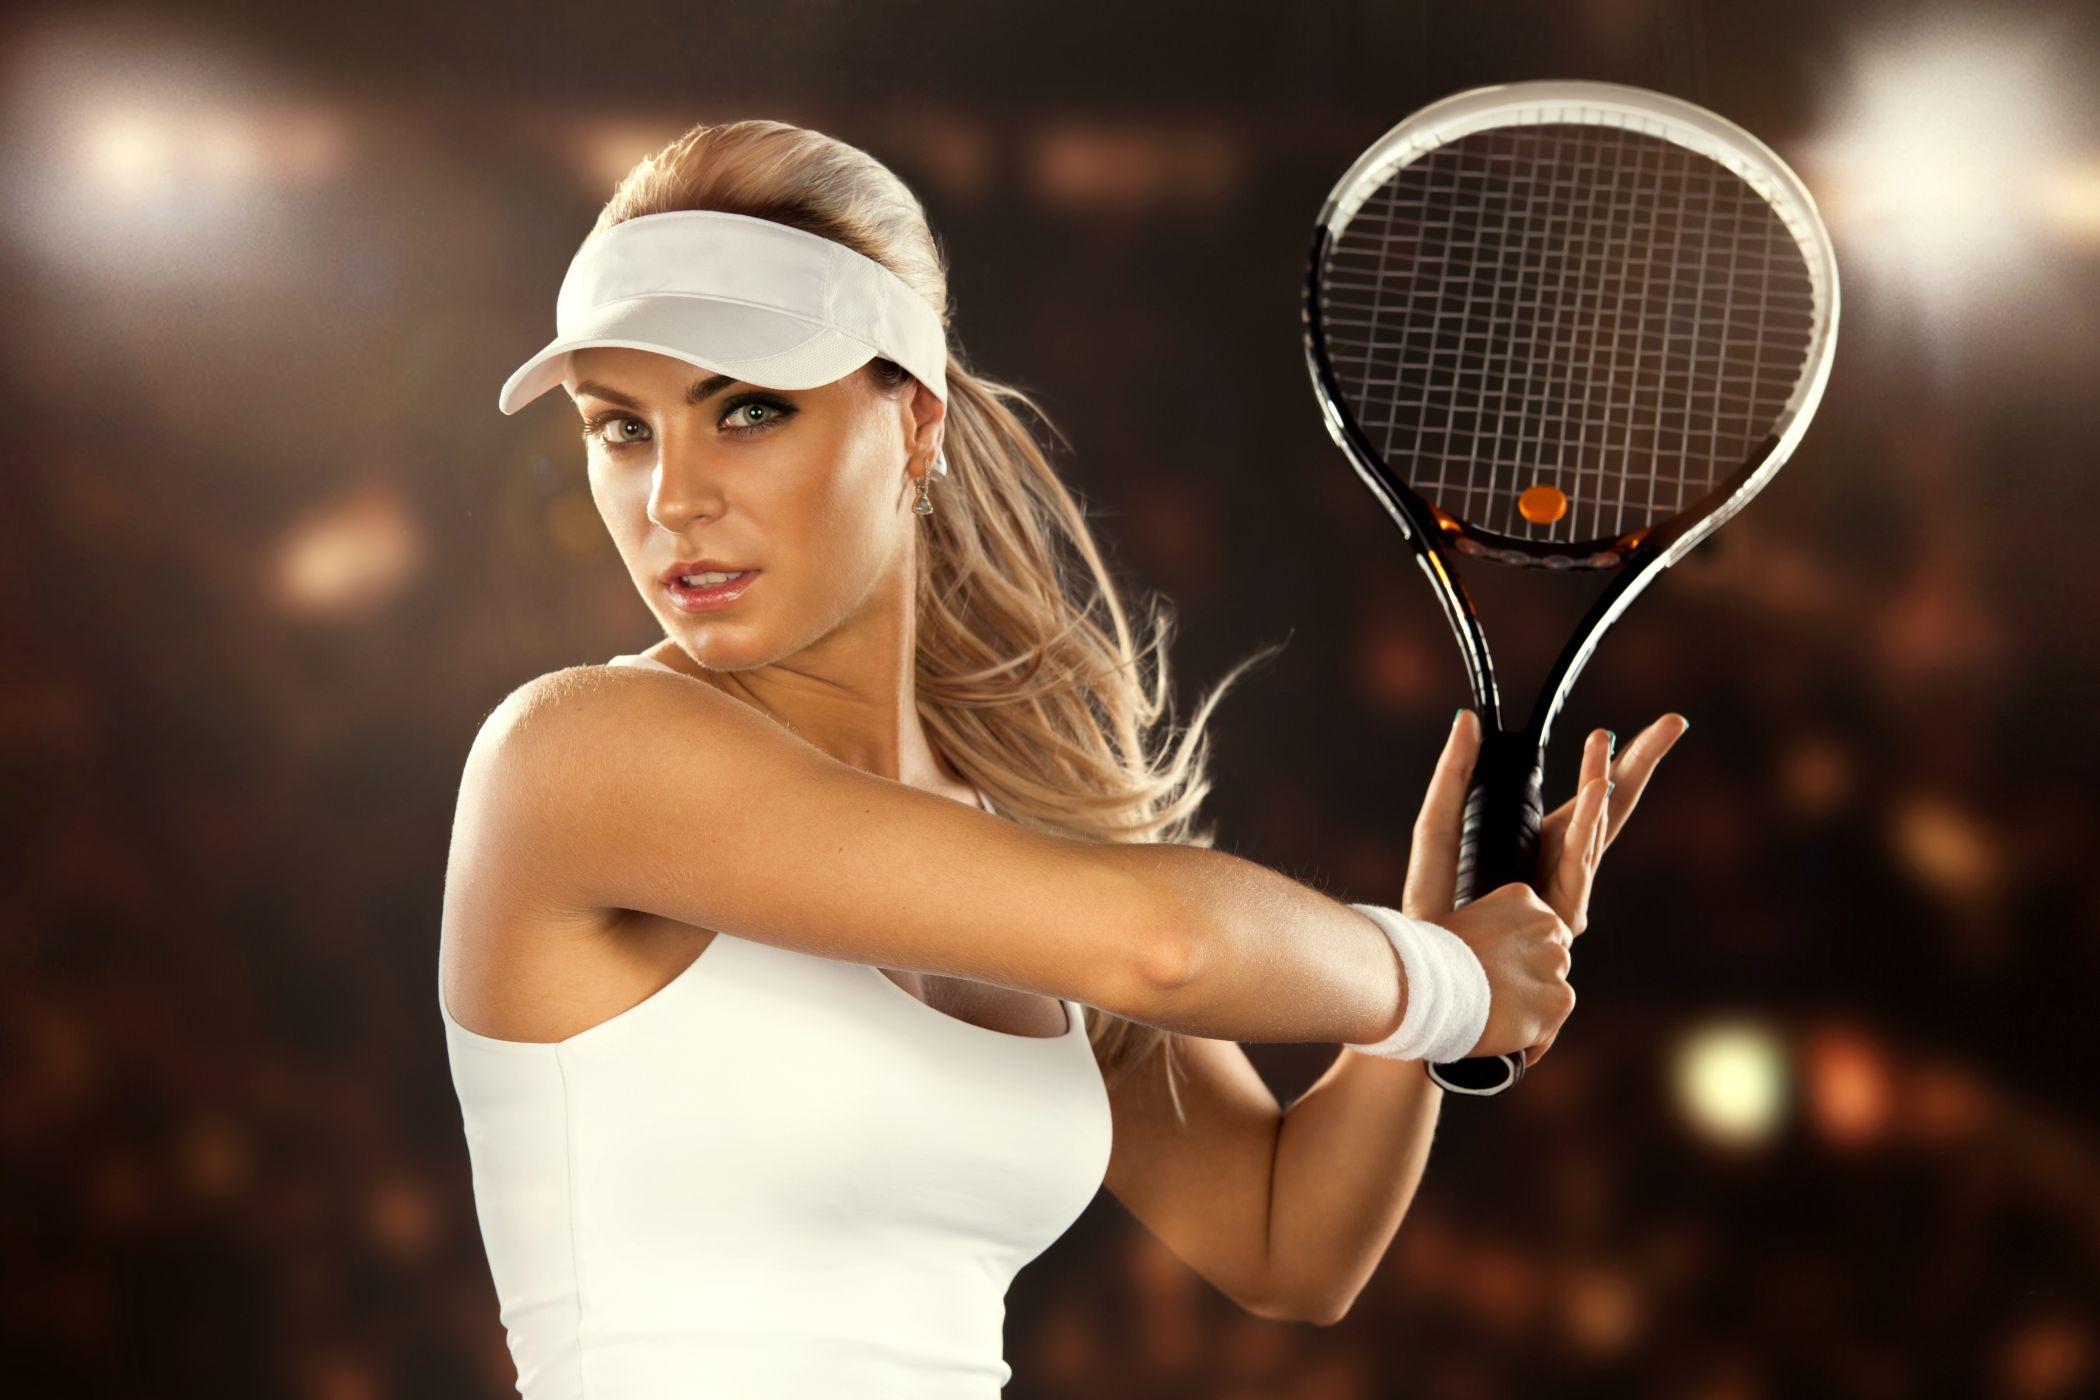 Meraklısına Tenis